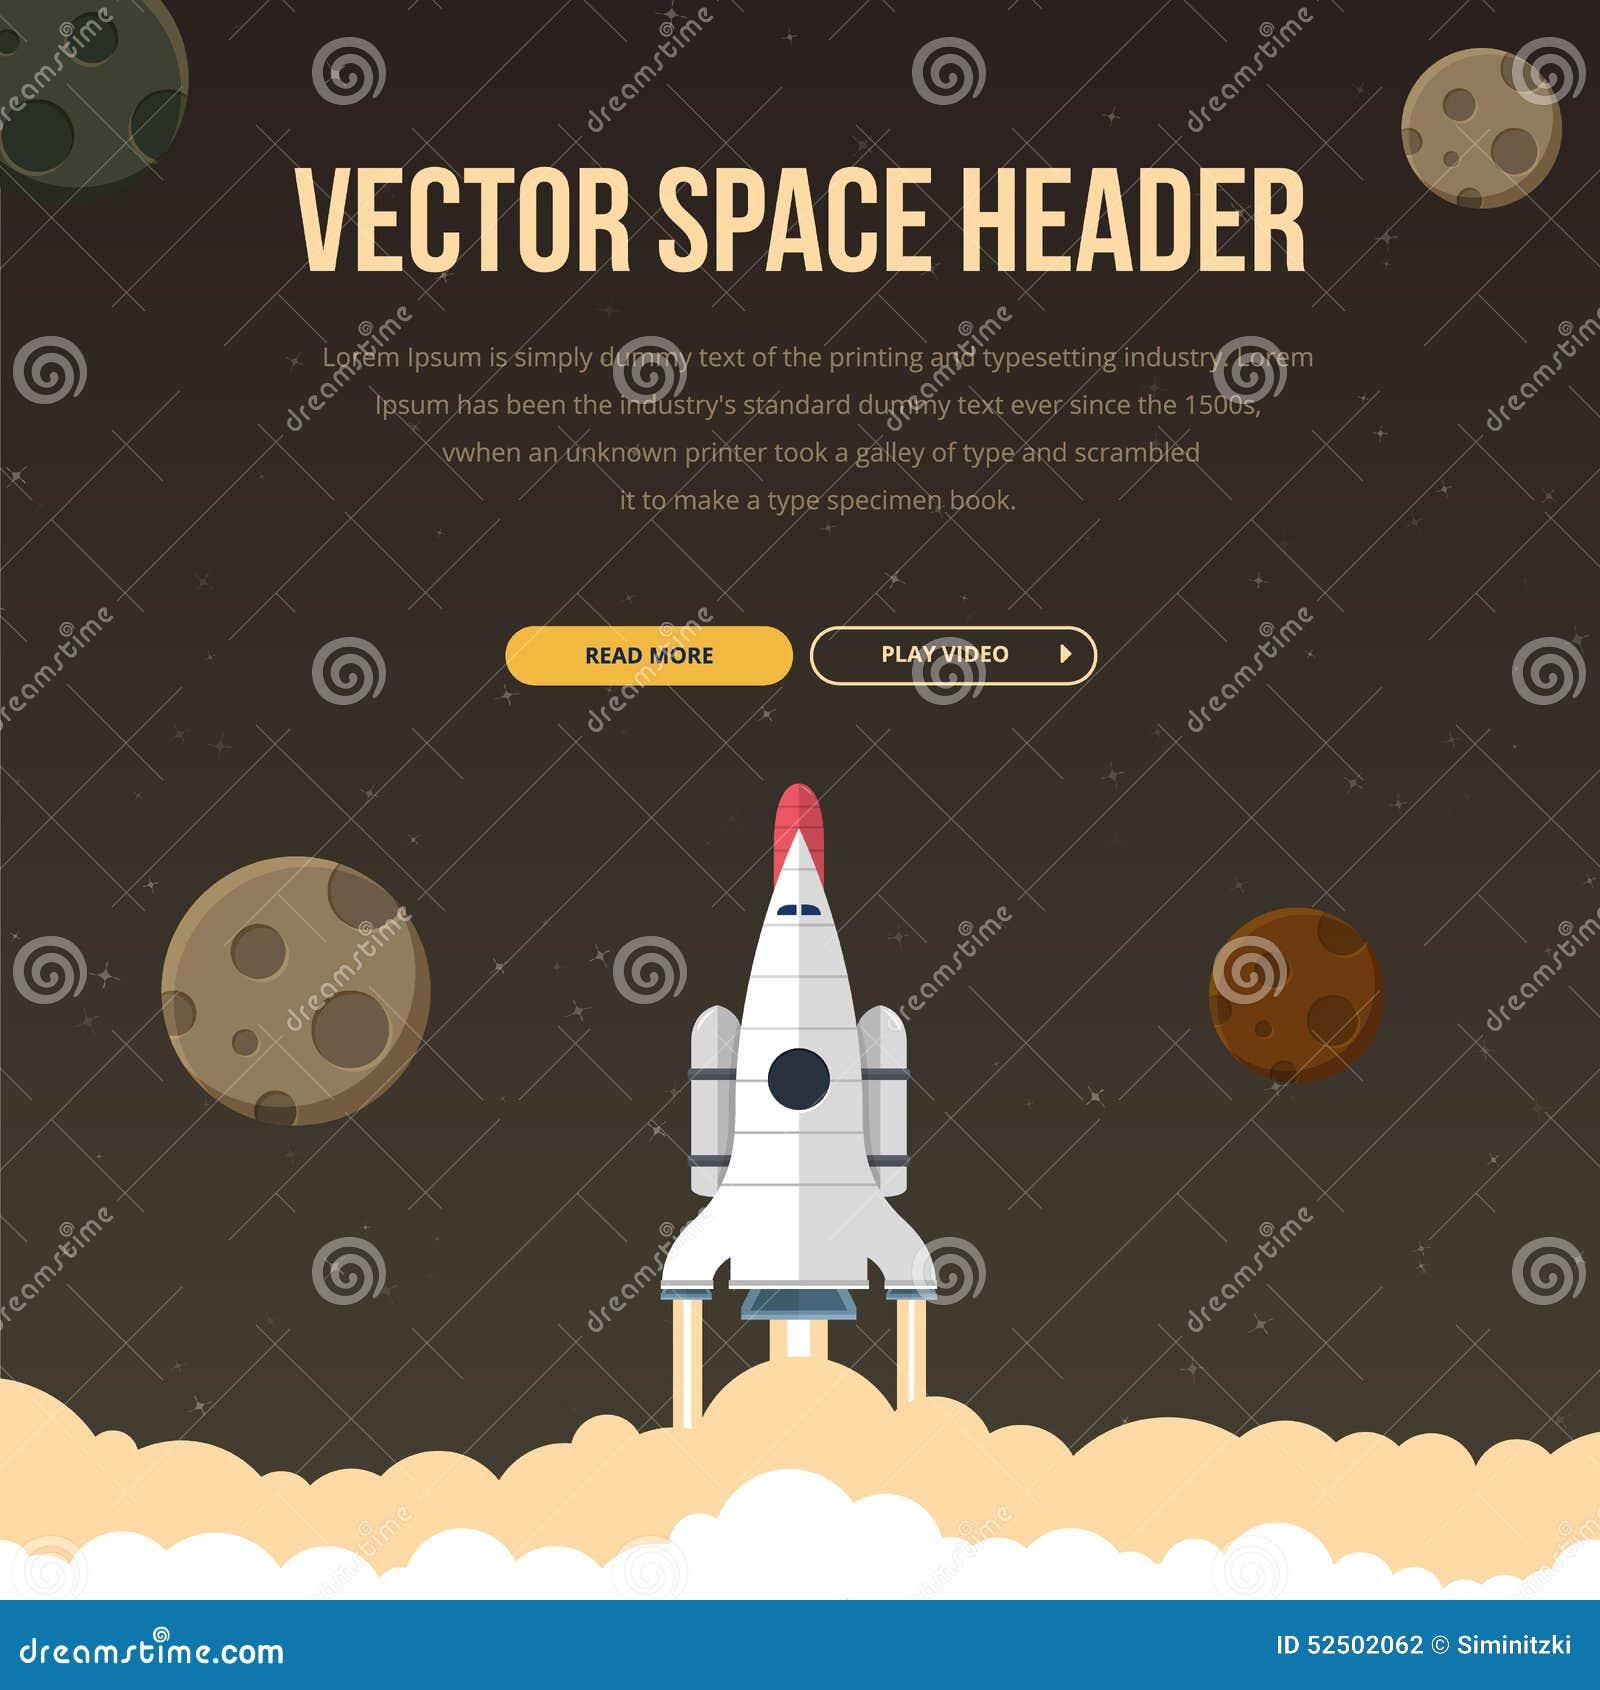 Flat illustration concept for web development for Graphic design agency